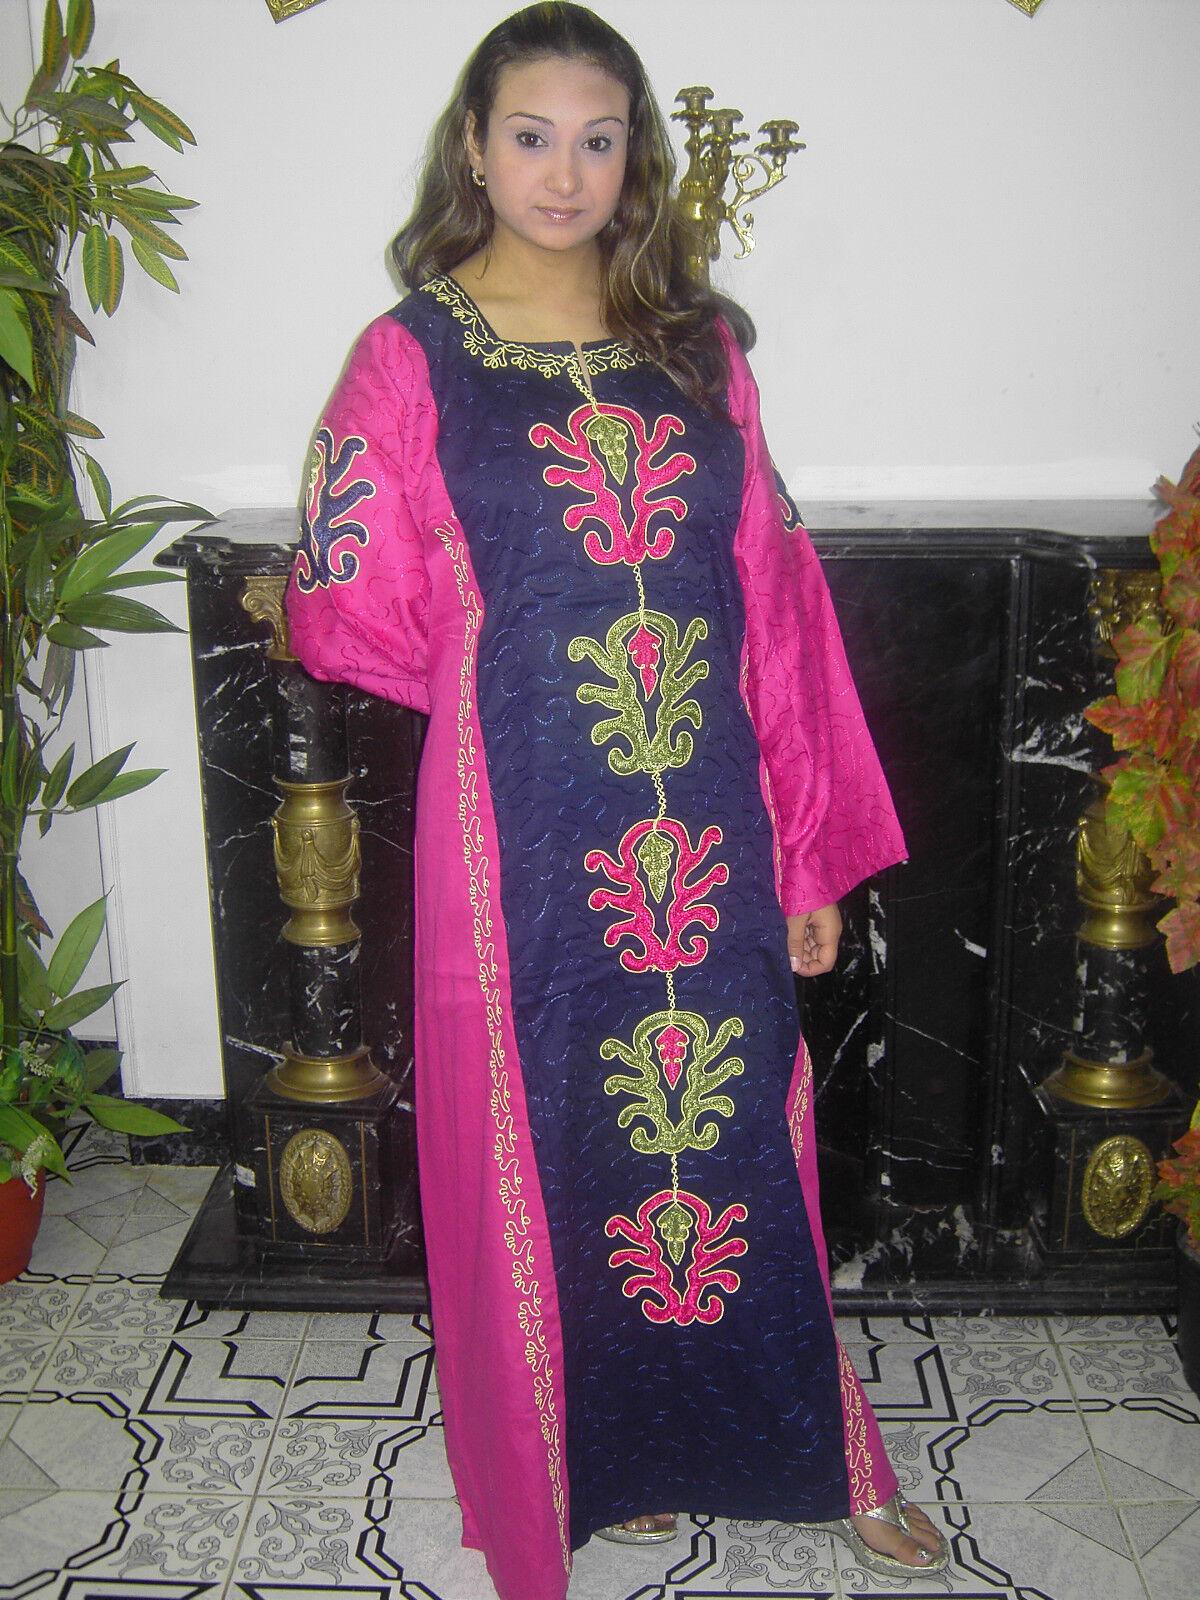 KAFTAN HAUSKLEID TUNIKA FESTKLEID ÄGYPTEN ABAYA HAUSKLEID  IN Rosa- ABY00253